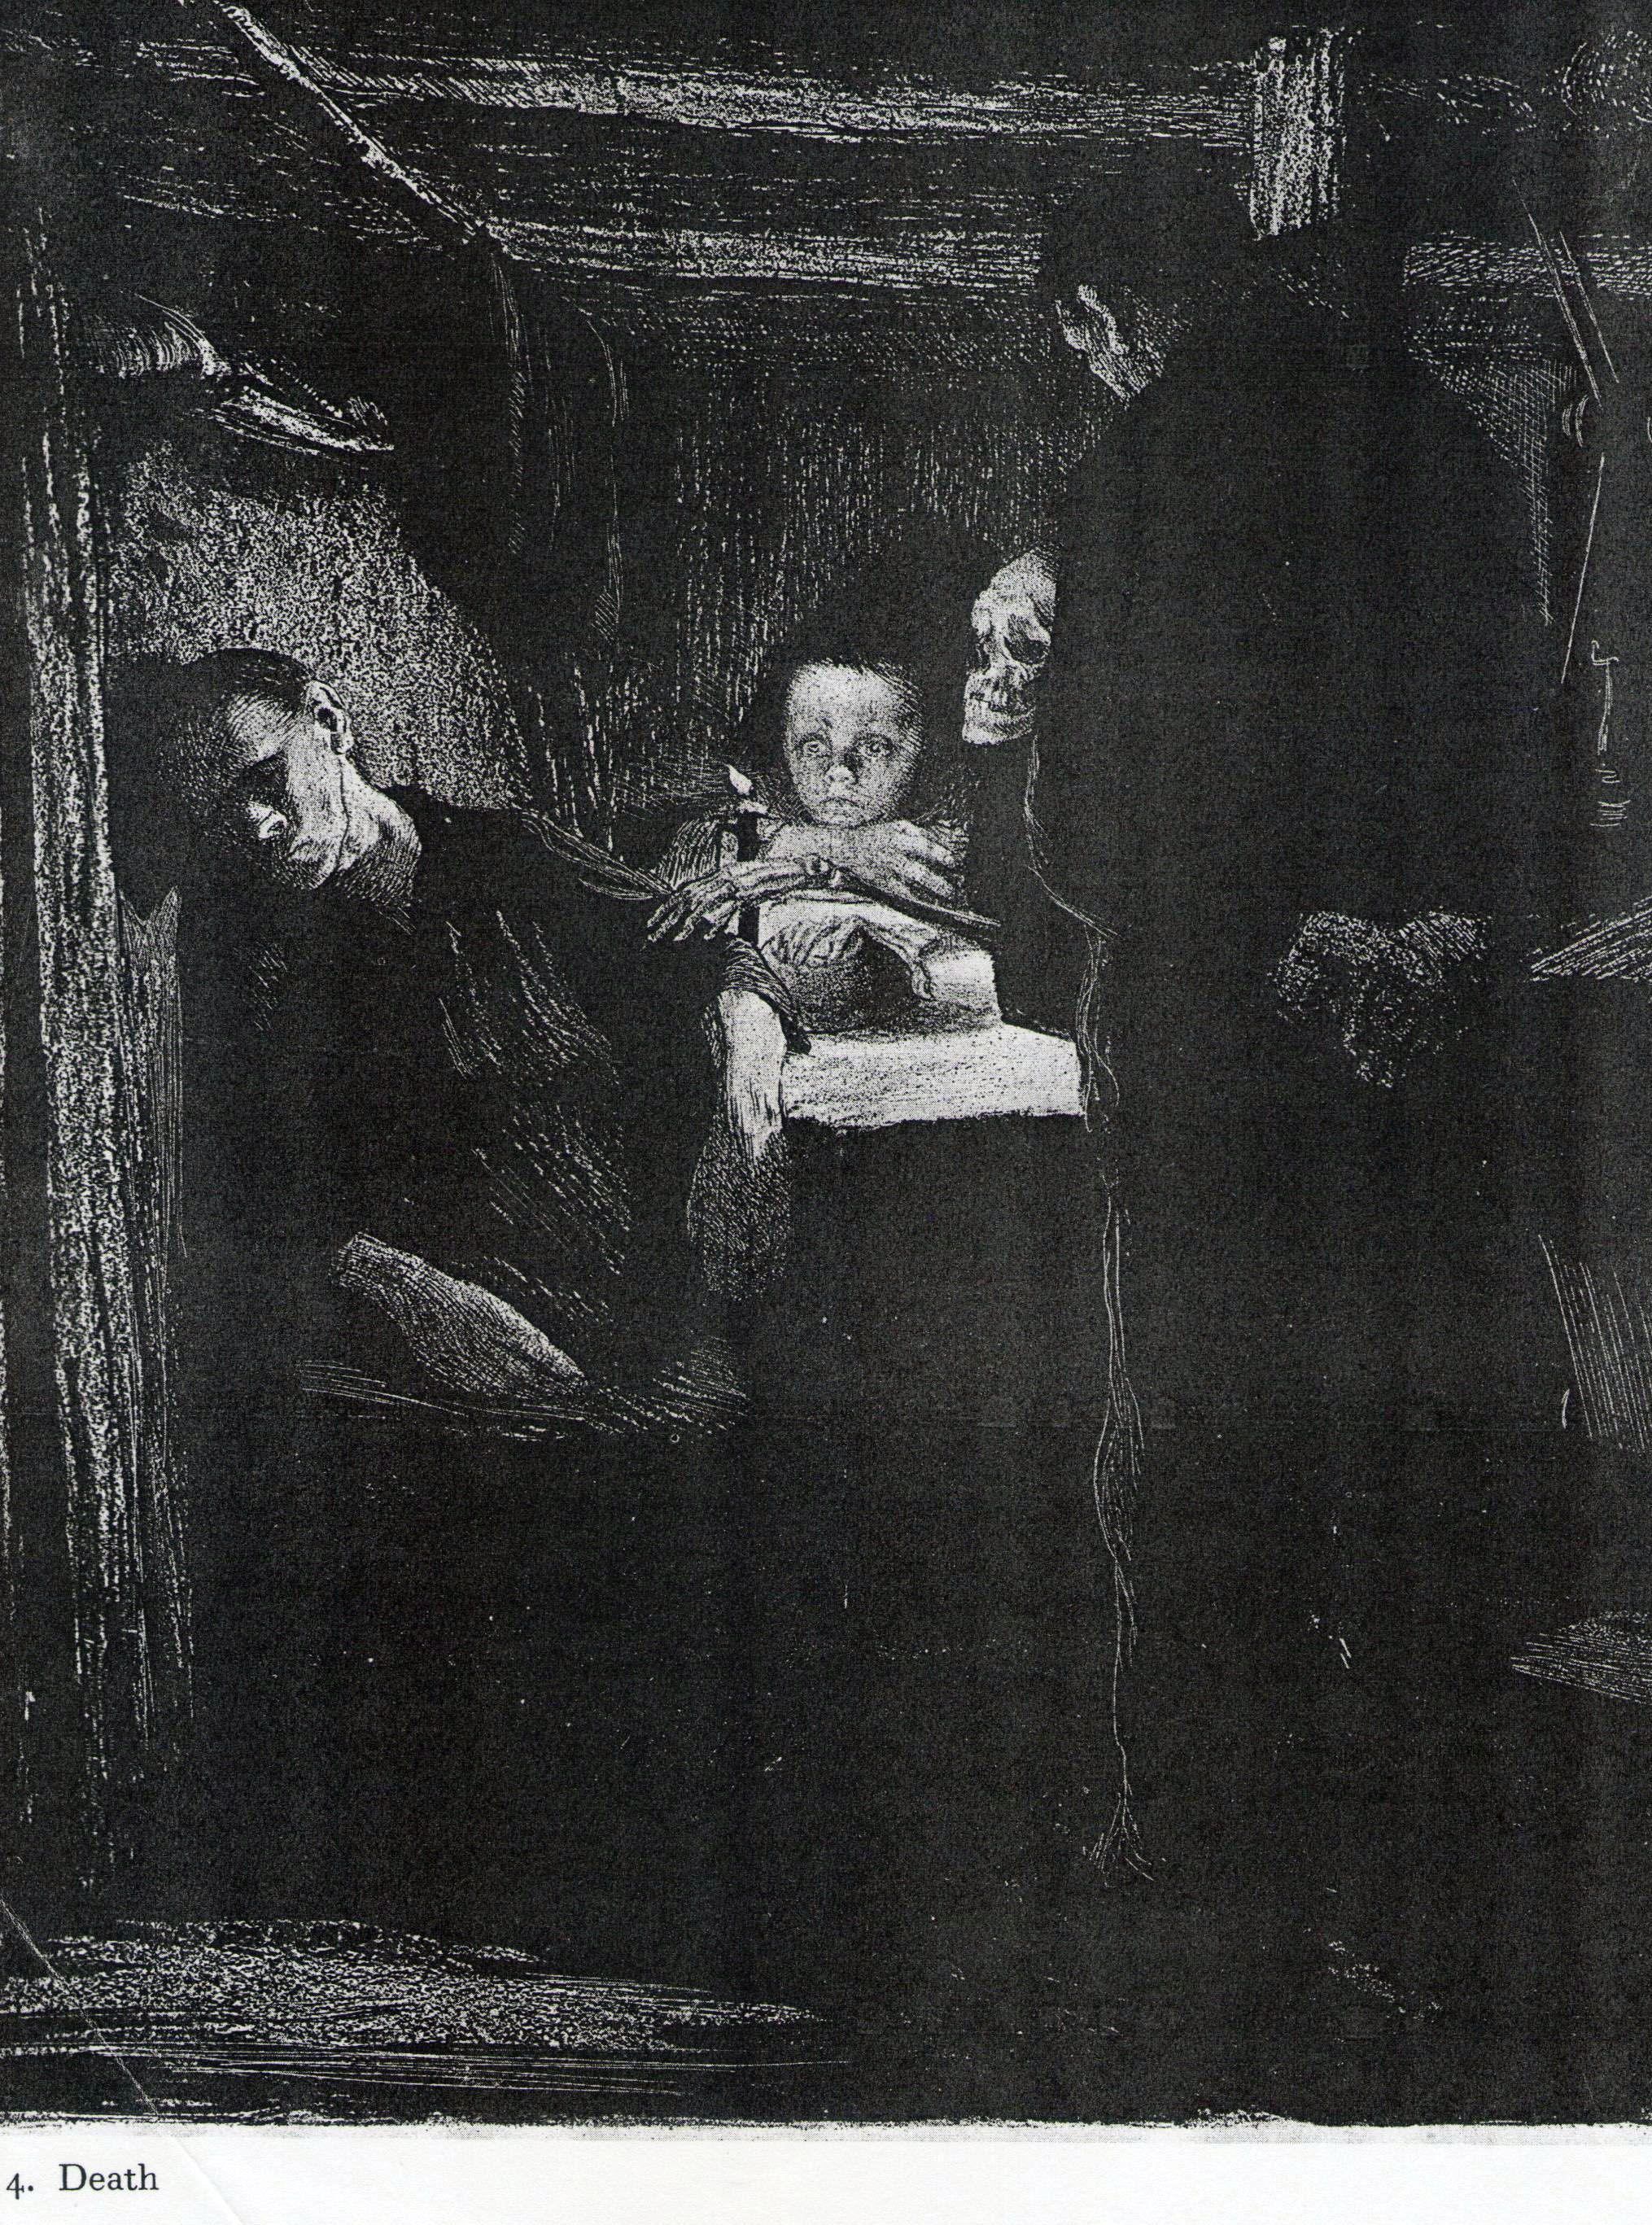 Kathe Kollwitz - Death